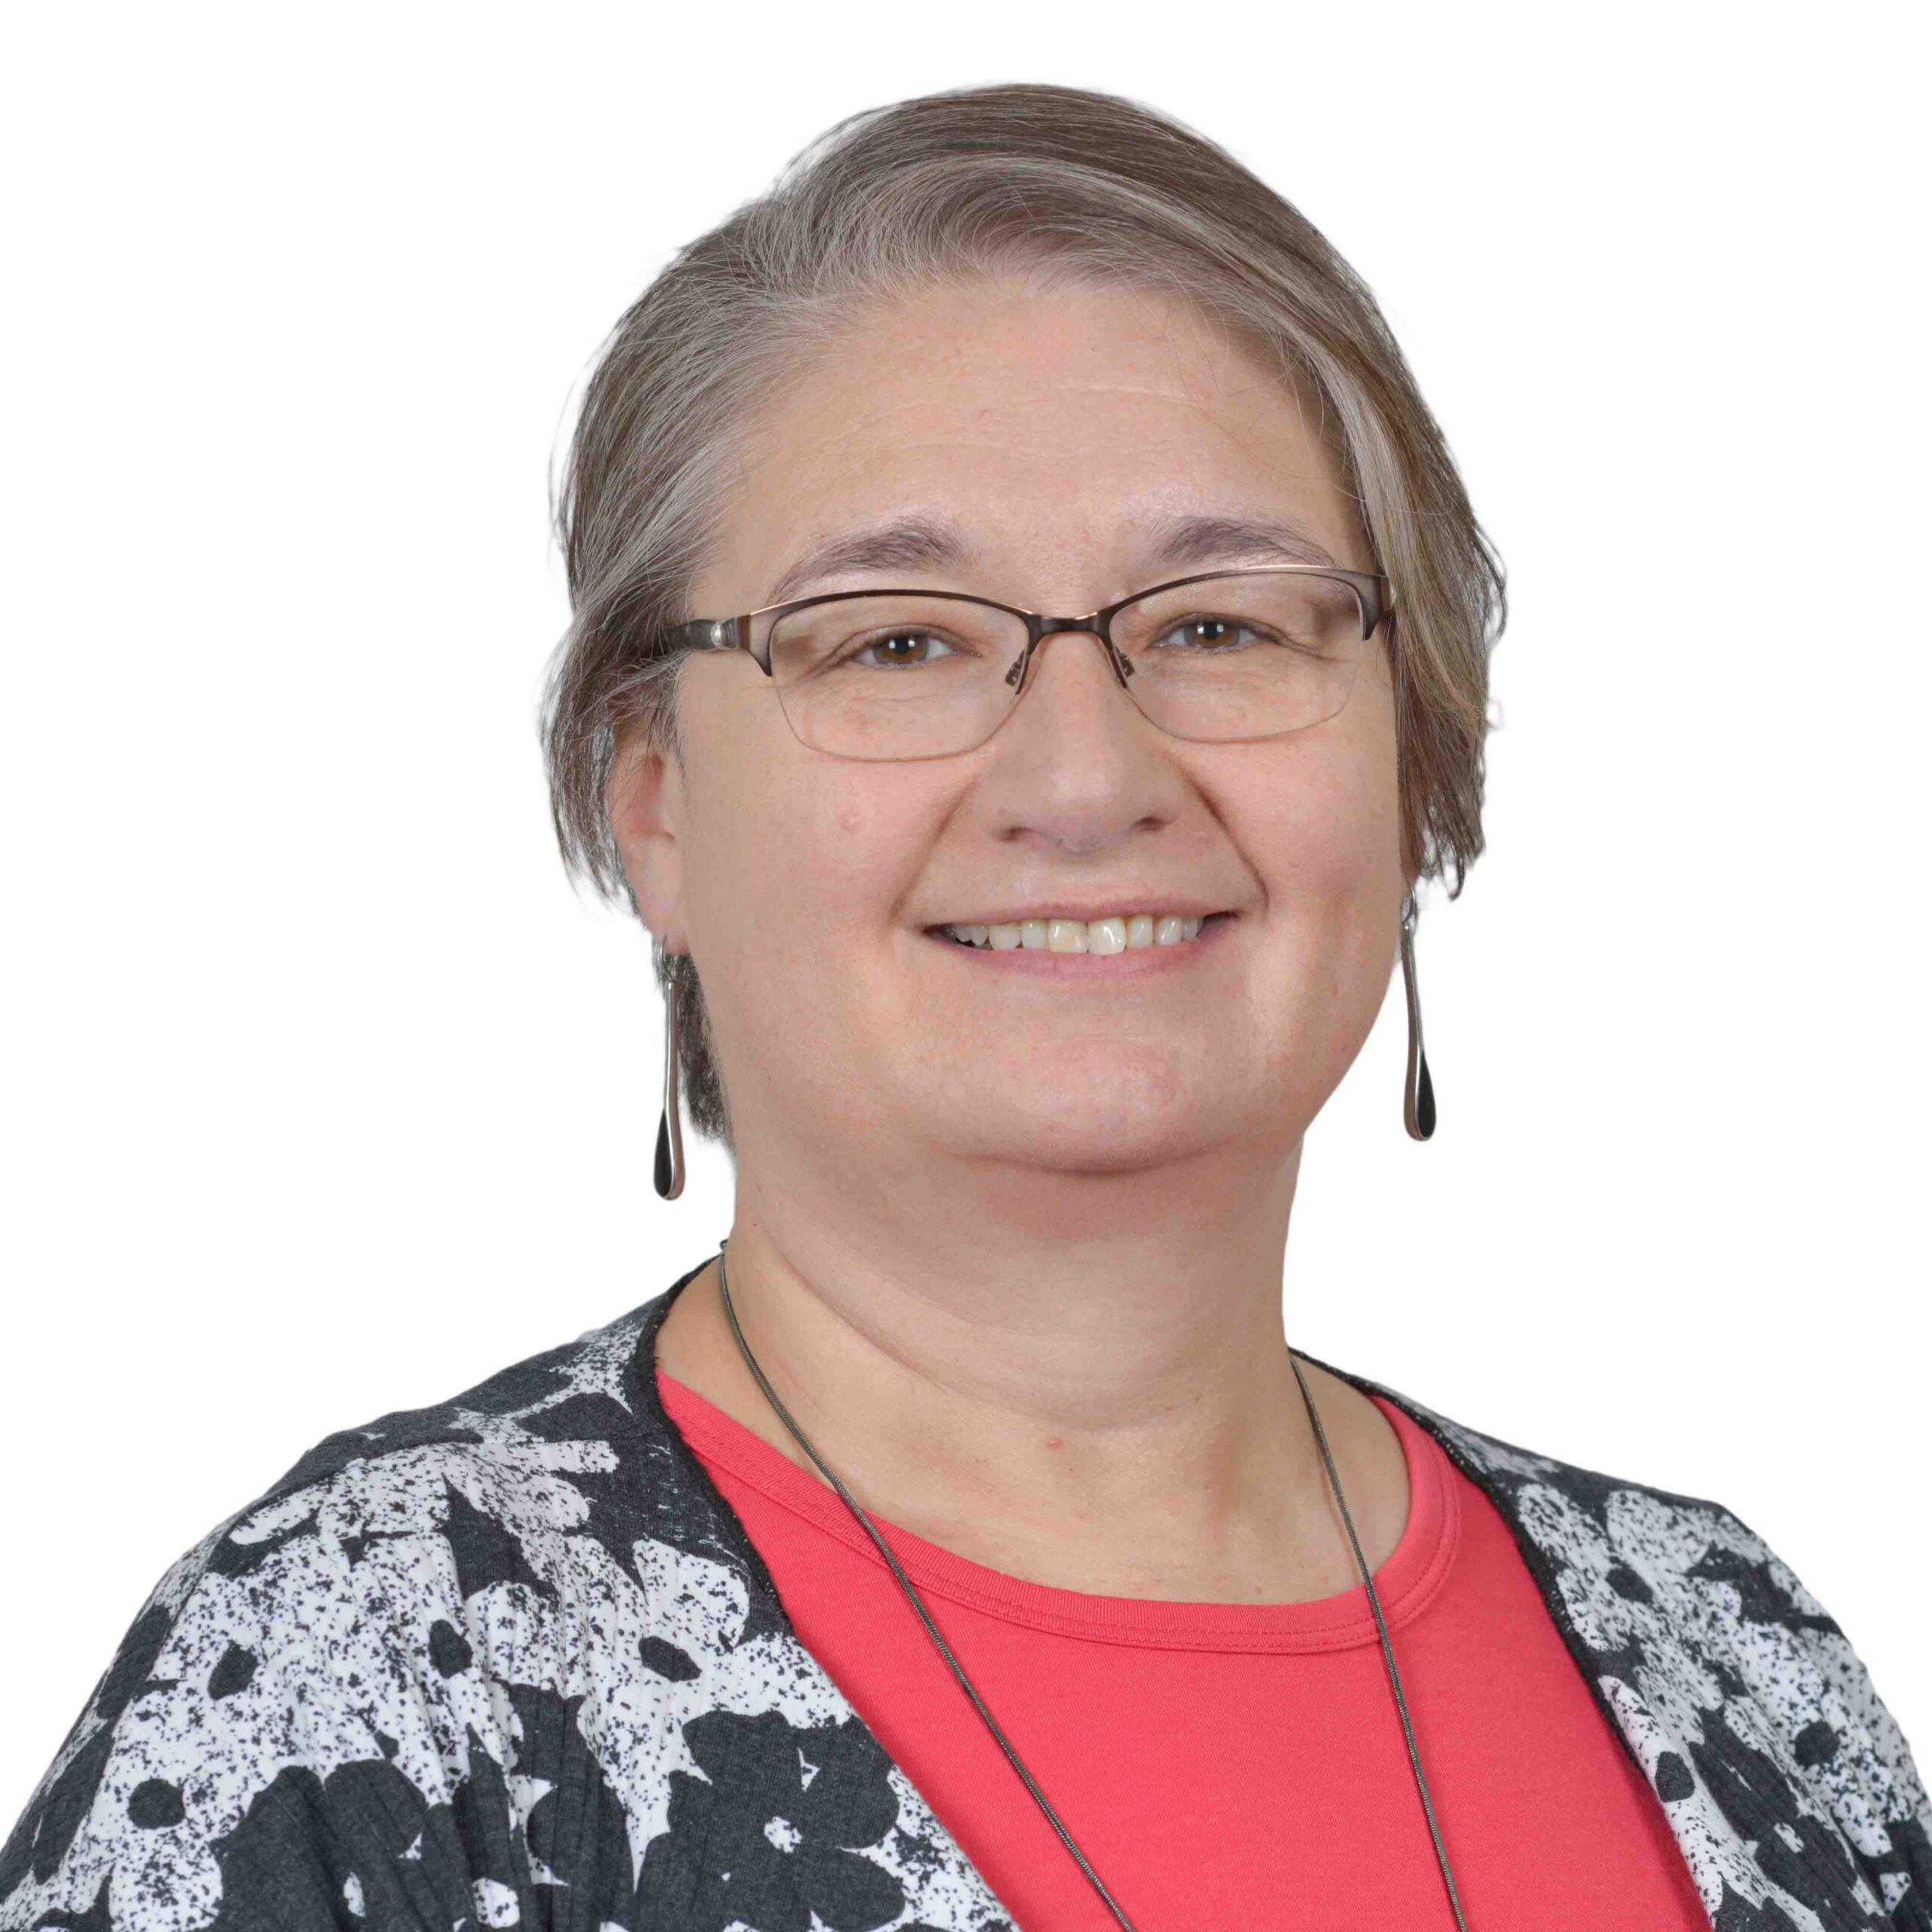 Lisa Leduc